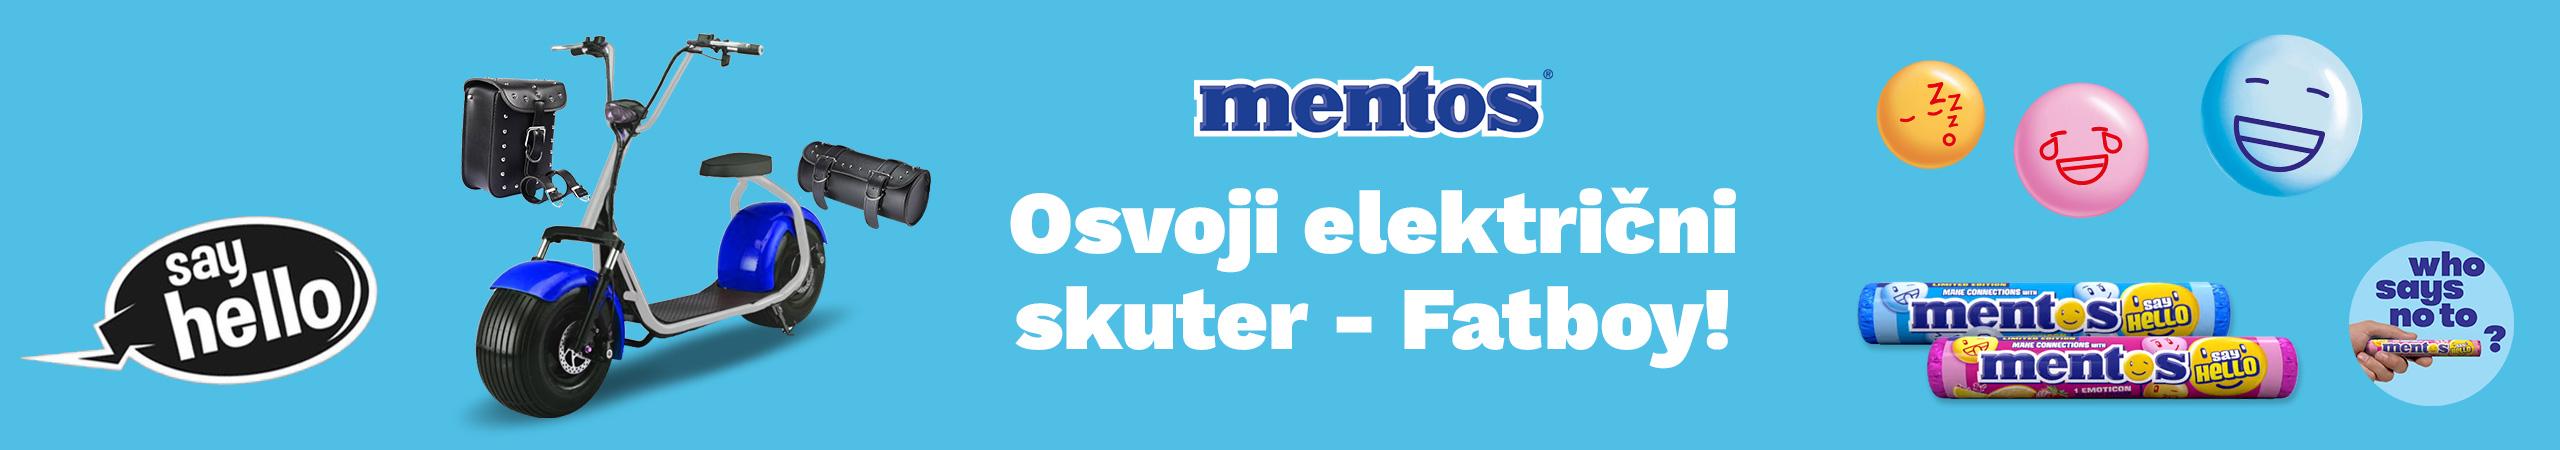 Mentos_ff_201905